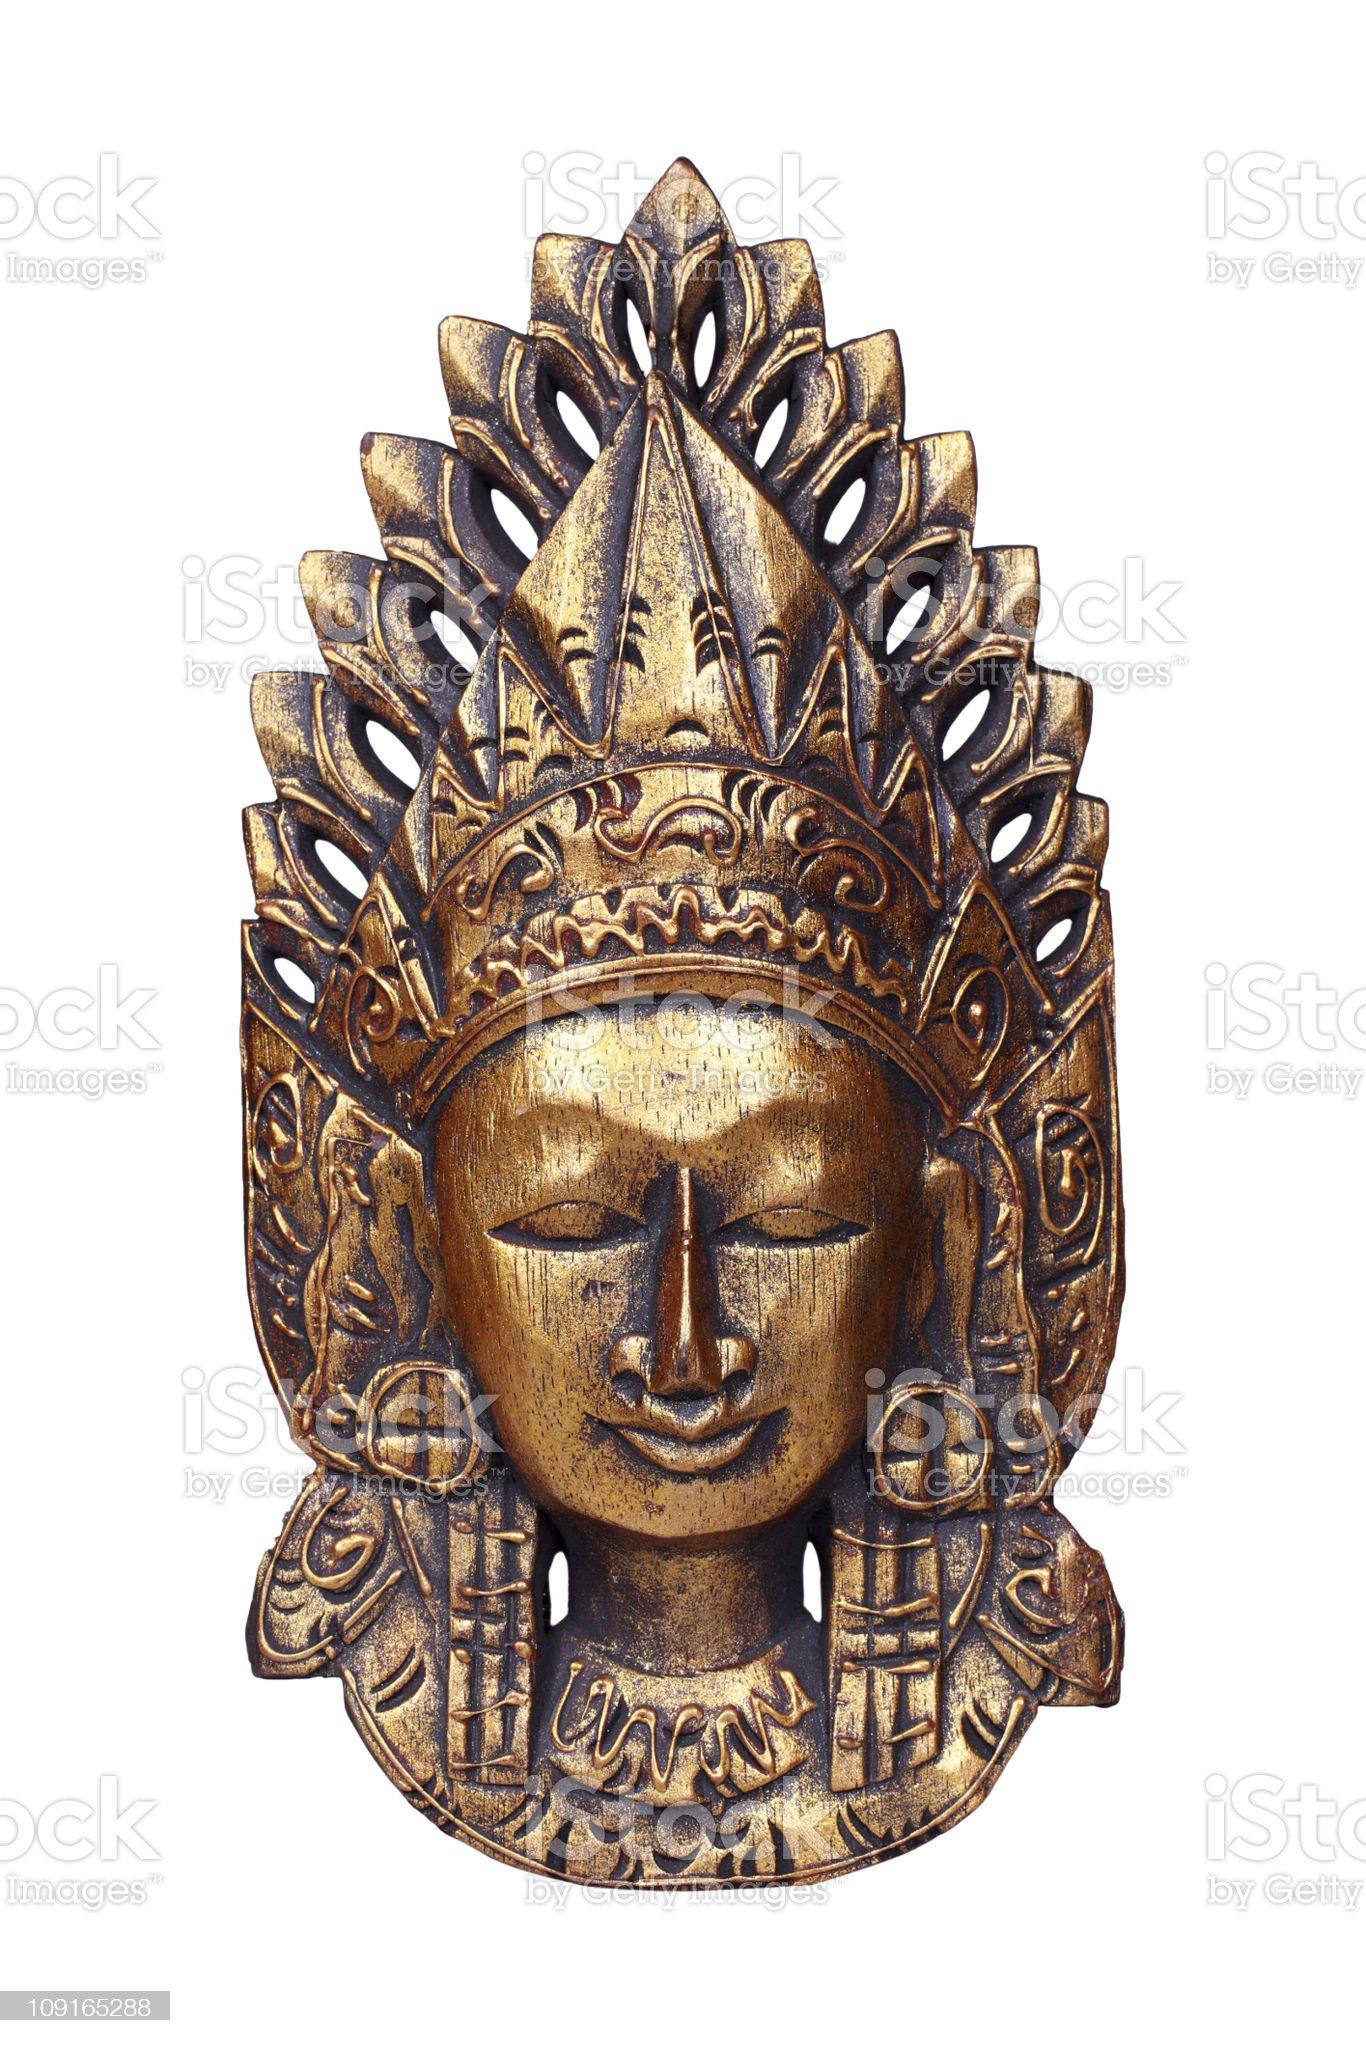 Mask of god Vishnu royalty-free stock photo